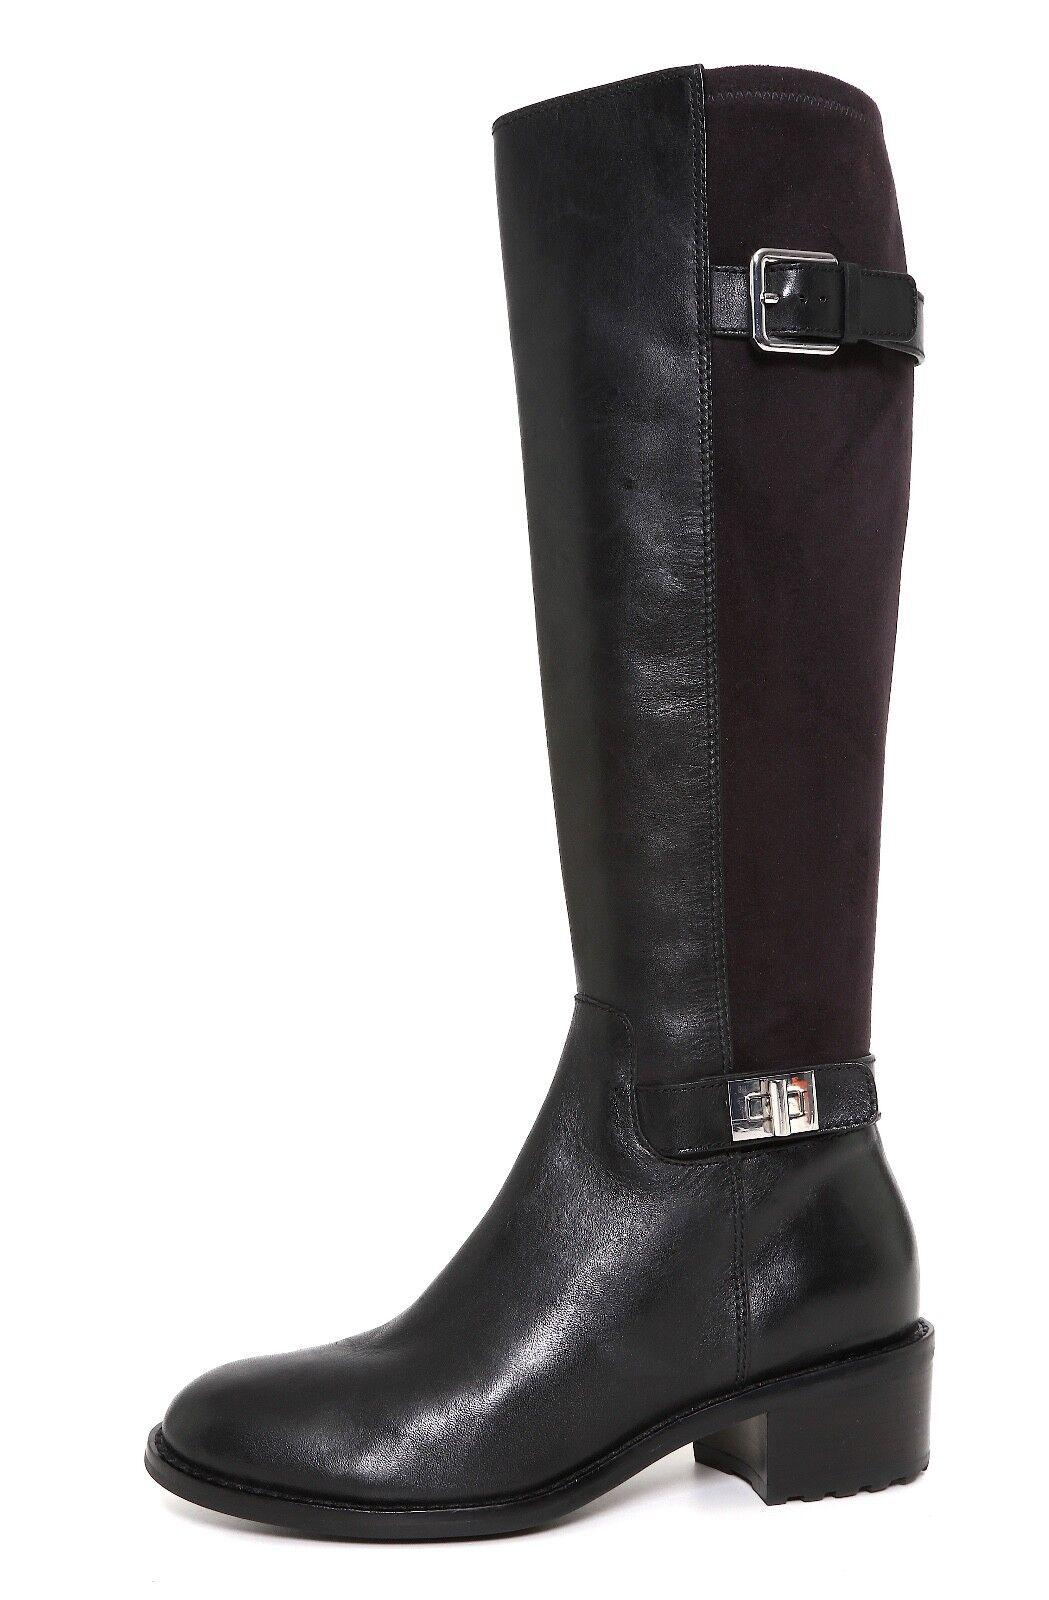 Cole Haan Kinley Suede Leather Boot Black Women Sz 5 B 6766